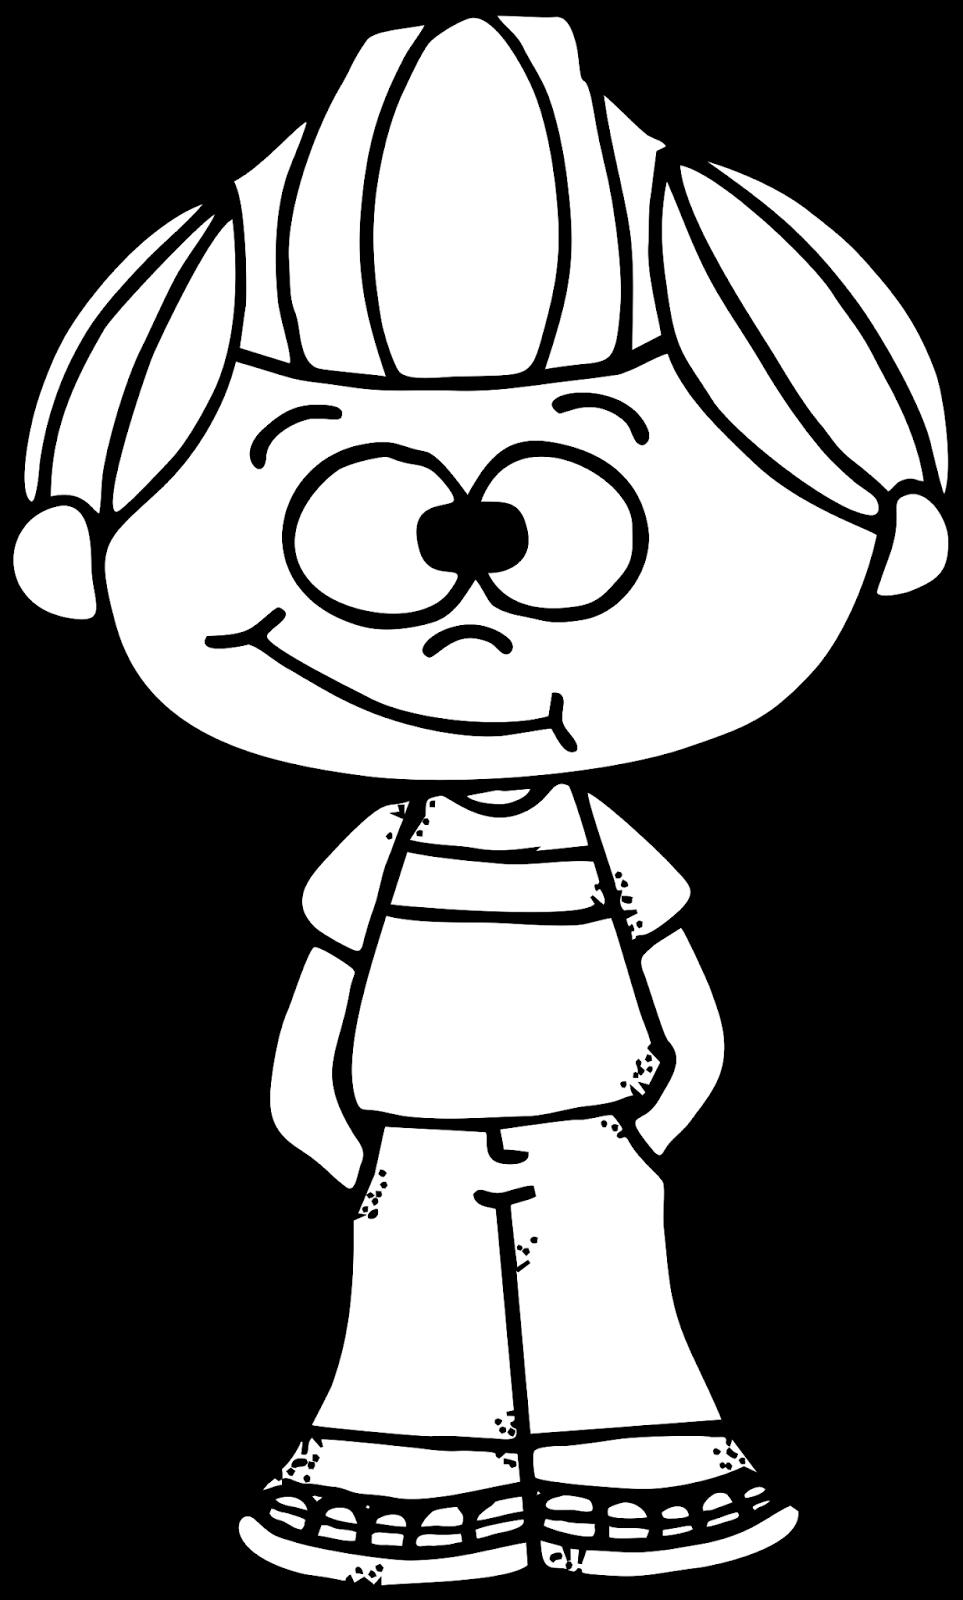 Worksheetjunkie Cute Boy Clipart Freebie Clip Art Freebies Coloring Pages Clip Art